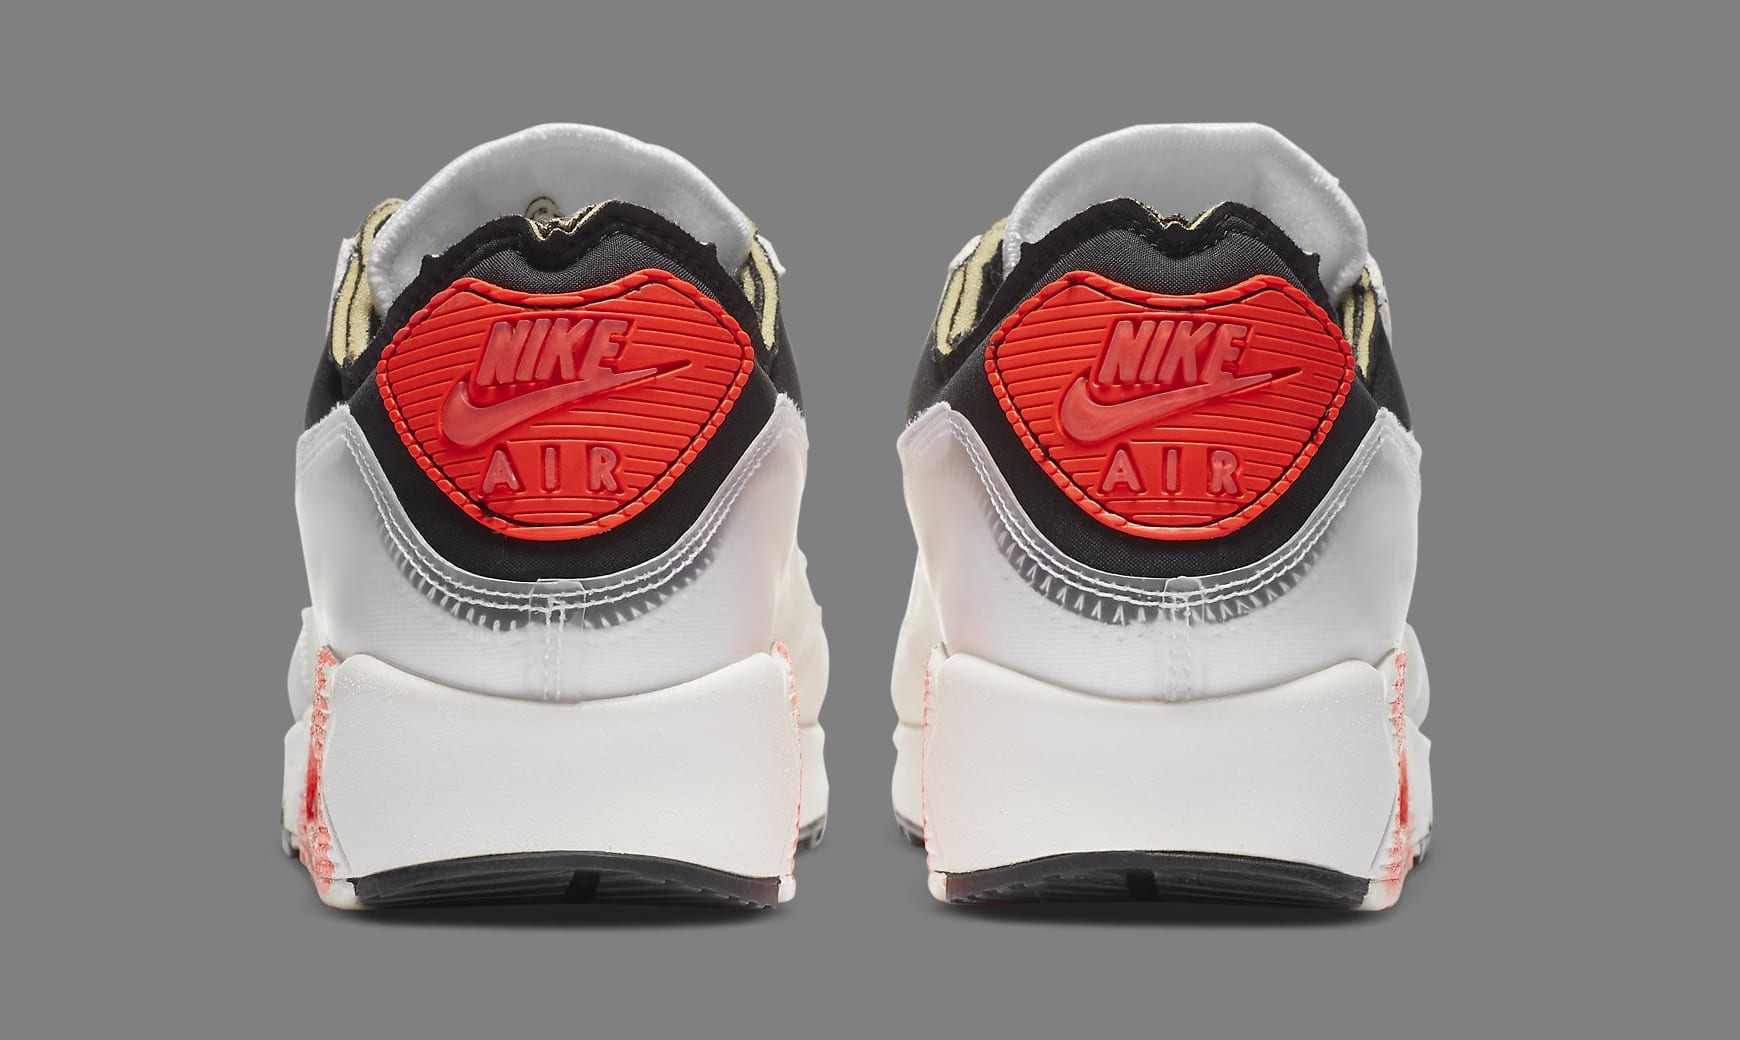 Nike Air Max 90 'Archetype' DC7856-100 Heel